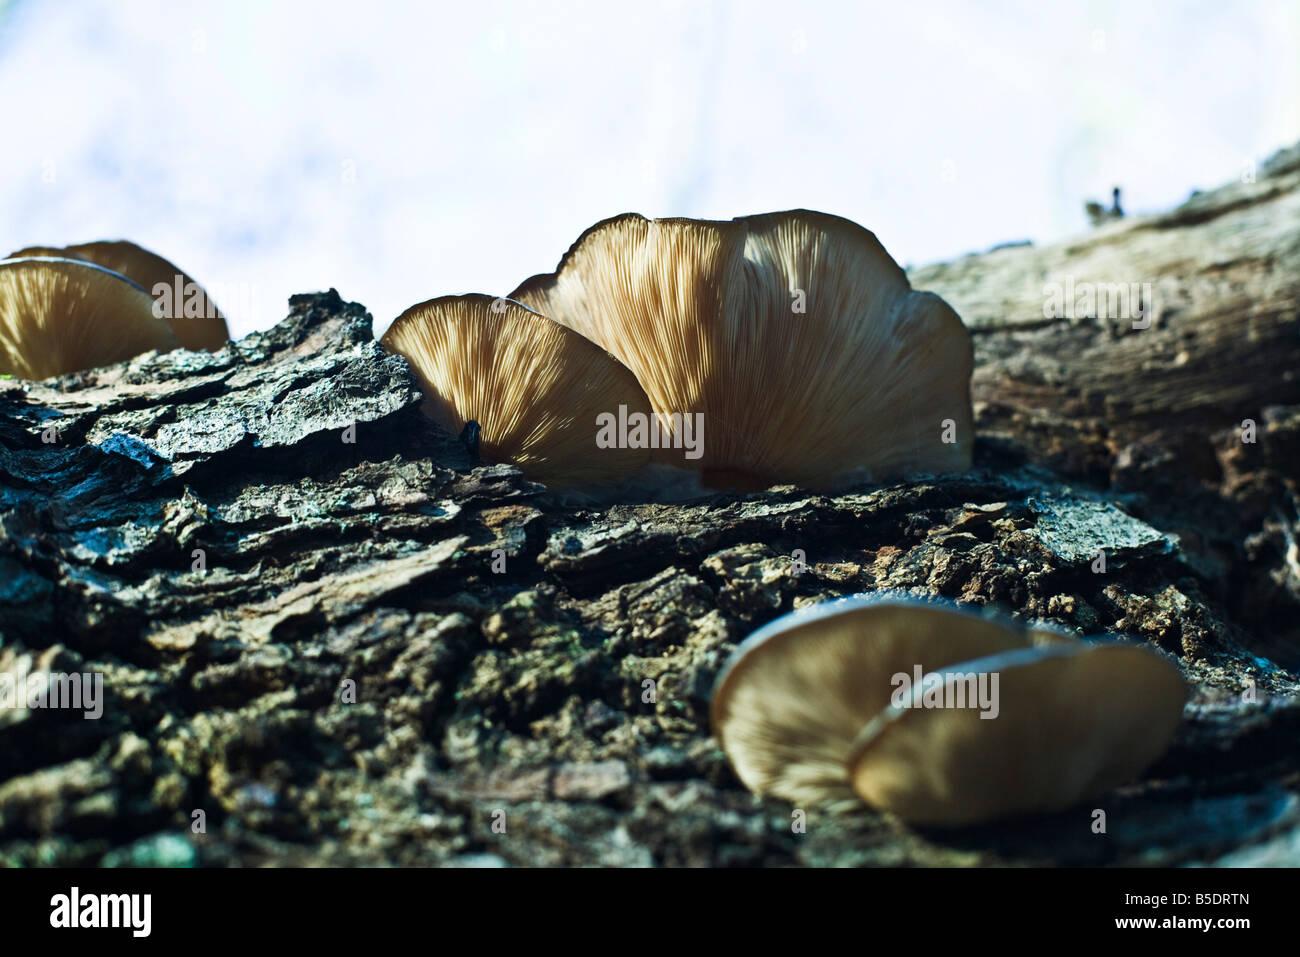 mycology stockfotos mycology bilder alamy. Black Bedroom Furniture Sets. Home Design Ideas